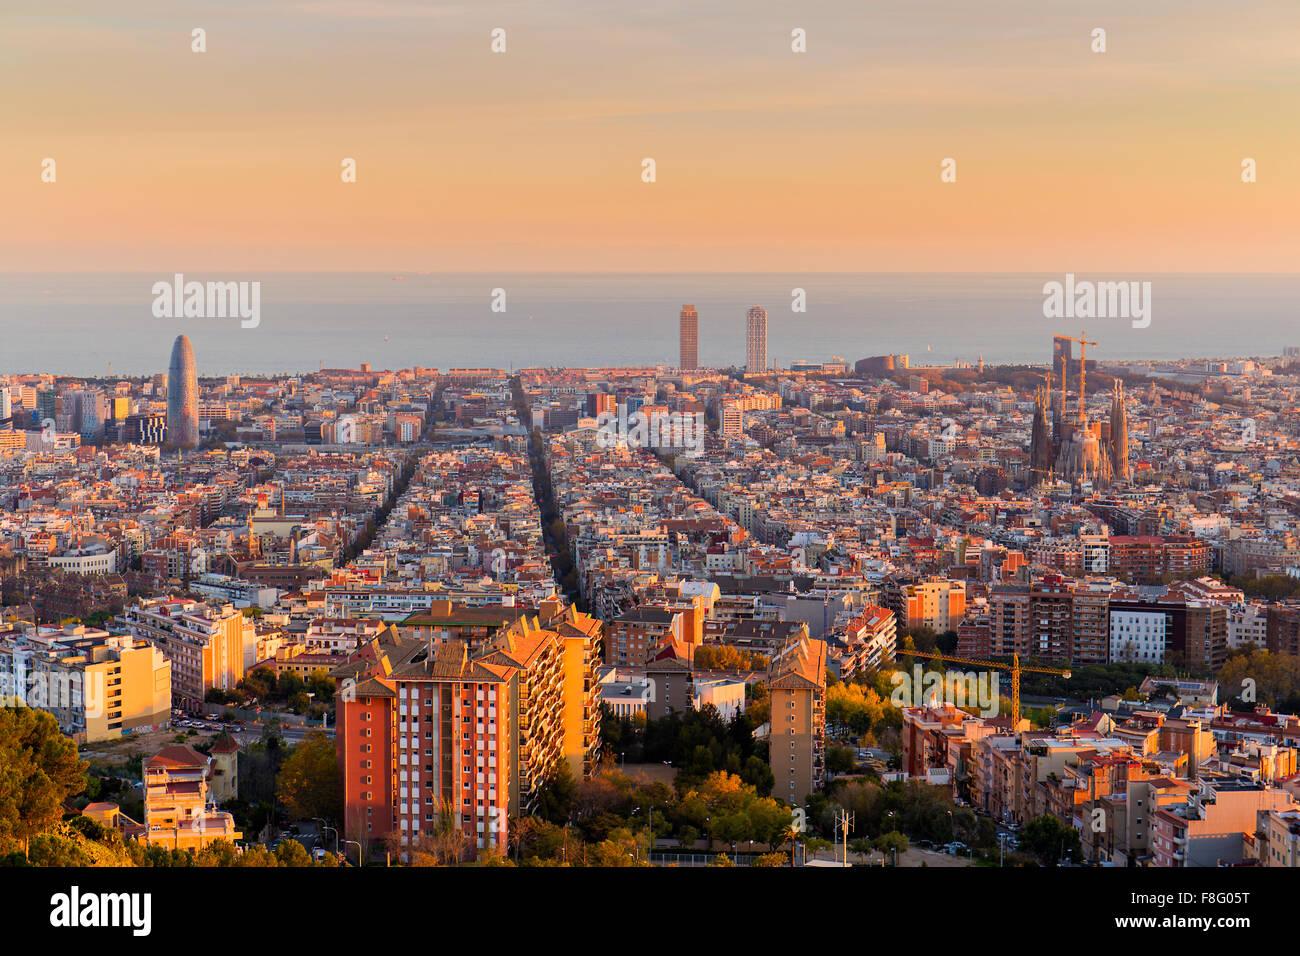 Barcelona skyline en la tarde a hora dorada Imagen De Stock